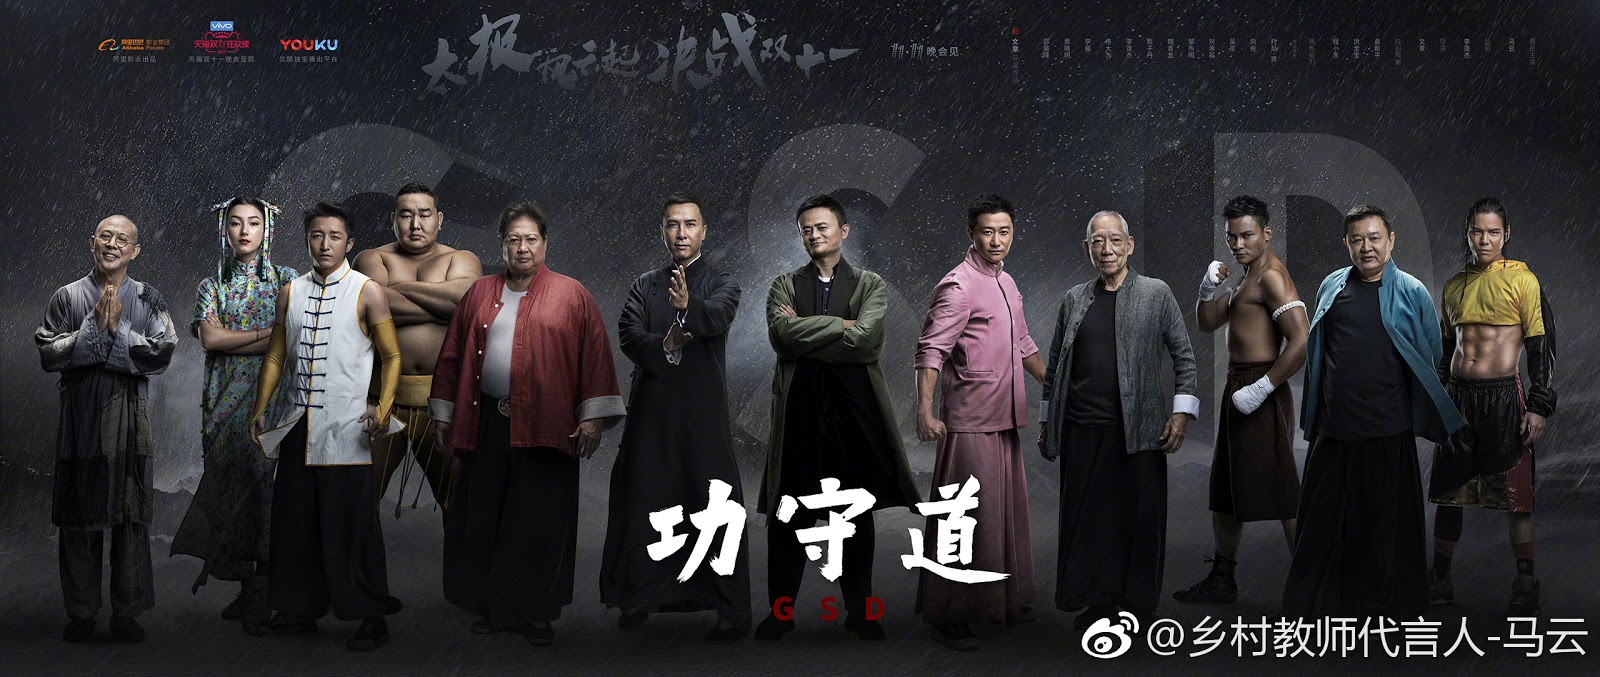 Alibaba Chairman Jack Ma stars in GSD